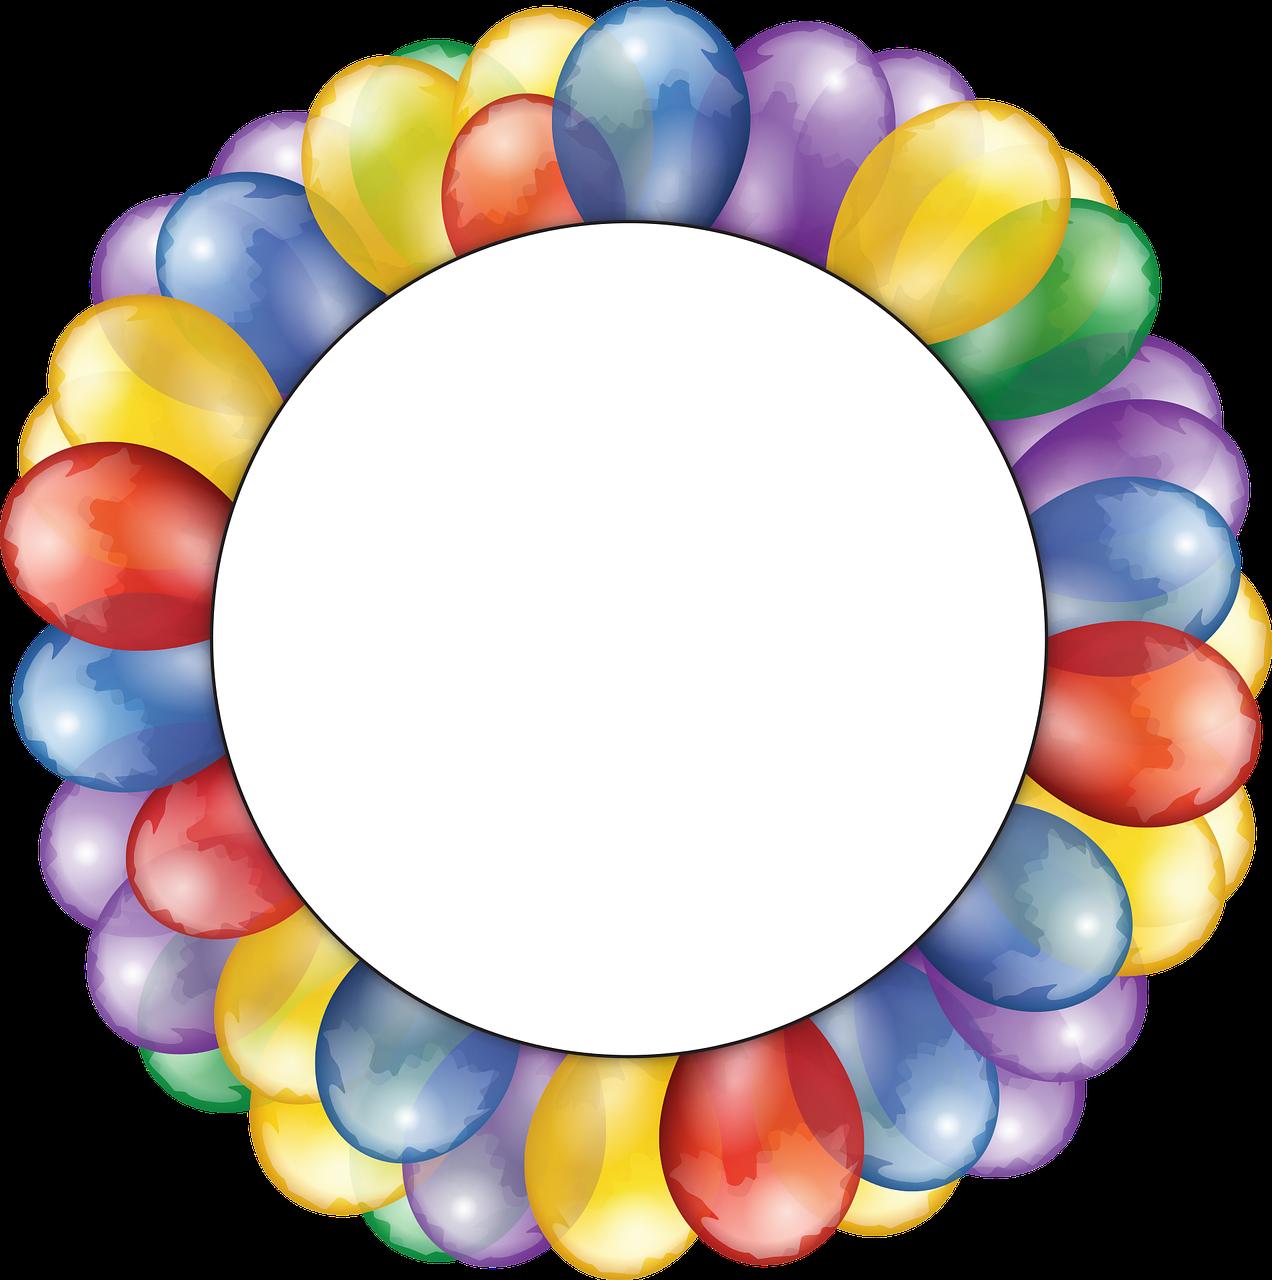 Фоторамки шаблоны круглые